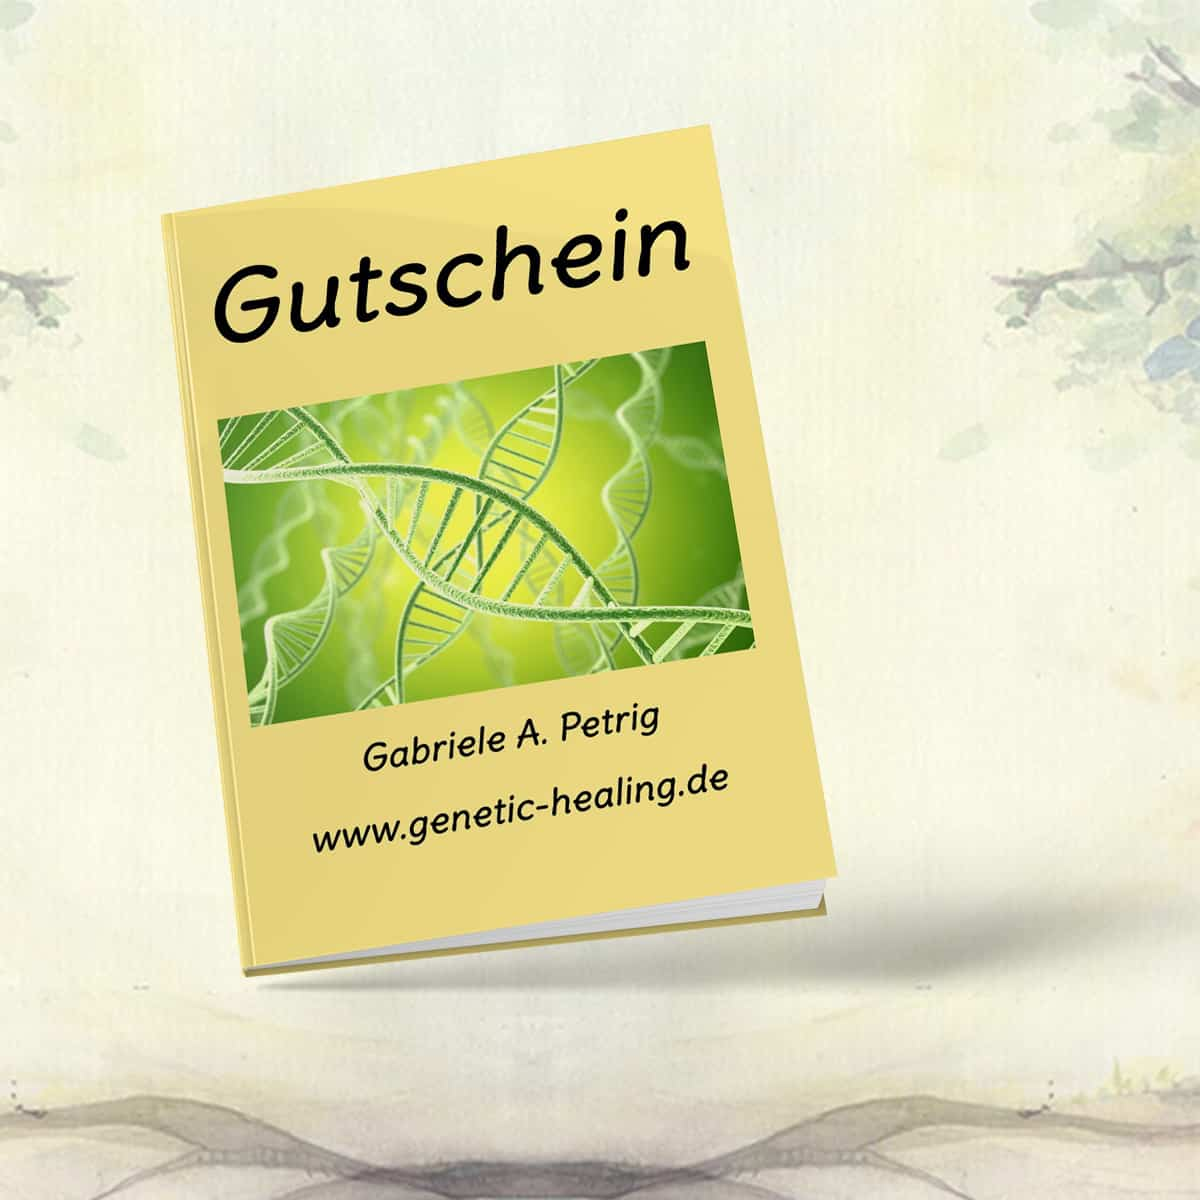 bonus-gutschein-kriegsenkel-genetic-healing